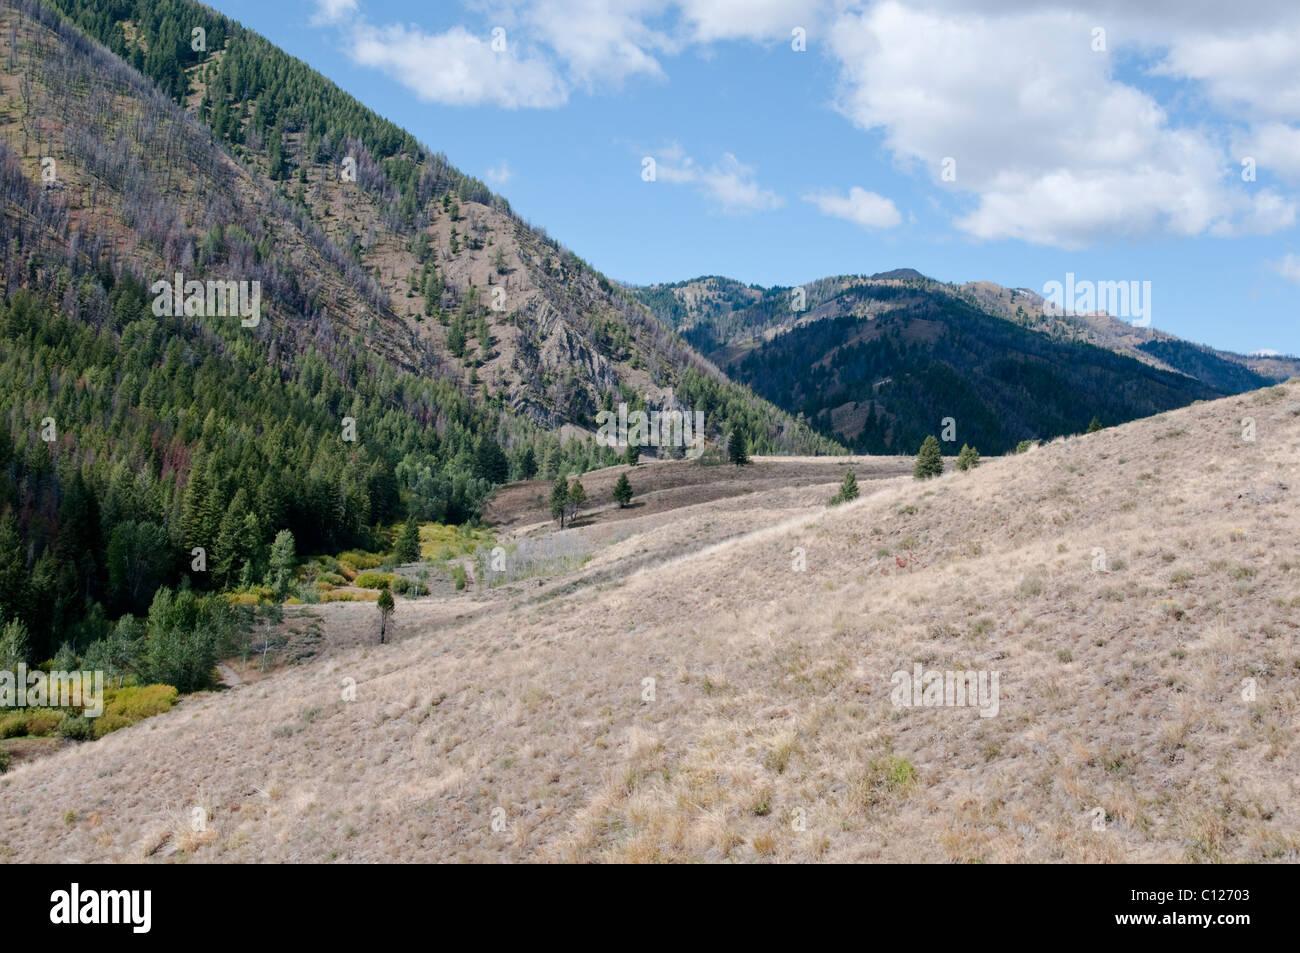 adam gulch loop walk,sun valley,world famous ski resort,home to the